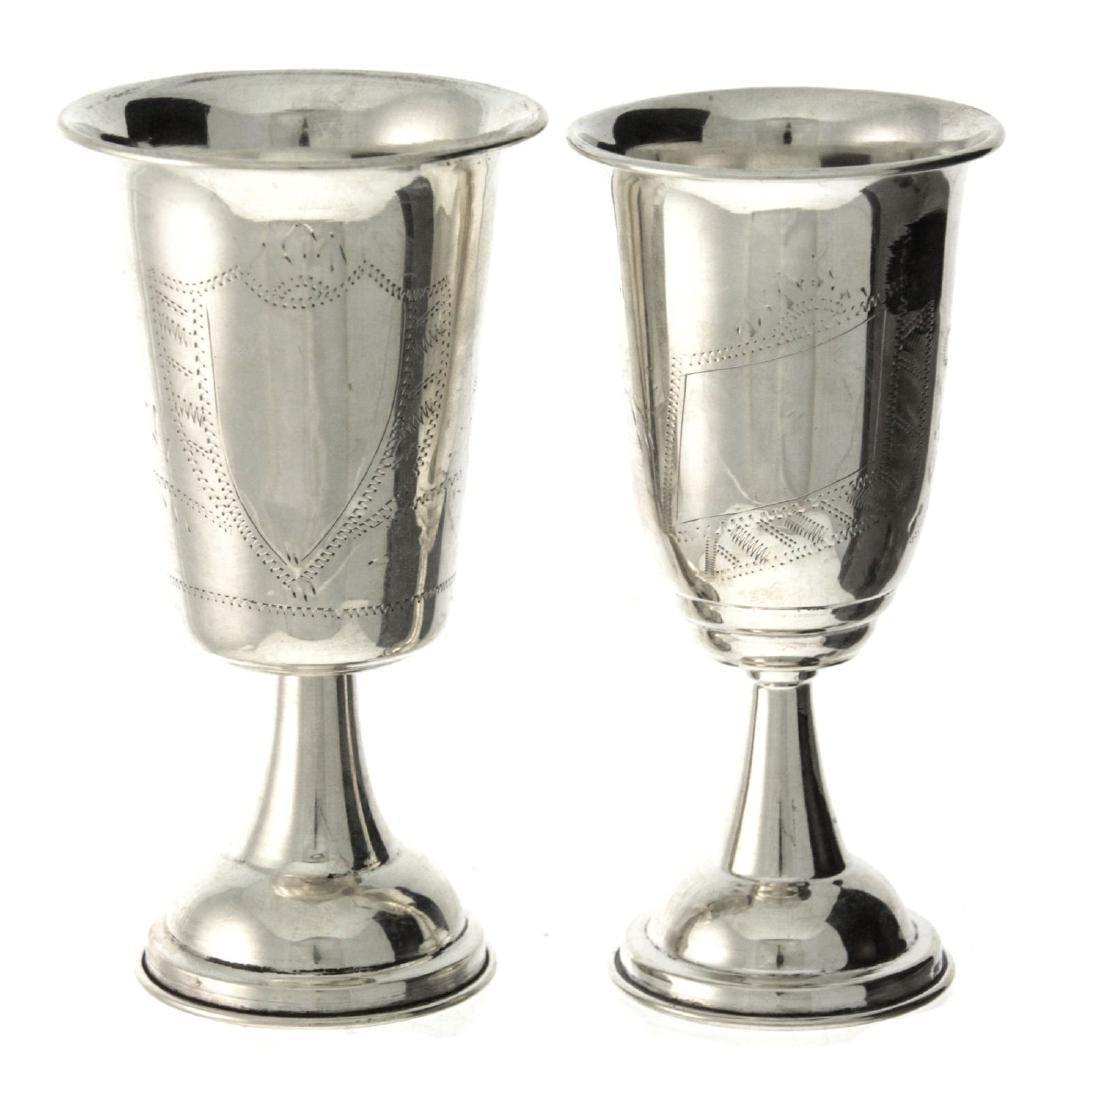 Lot of Five Silver Kiddush Cups. - 4